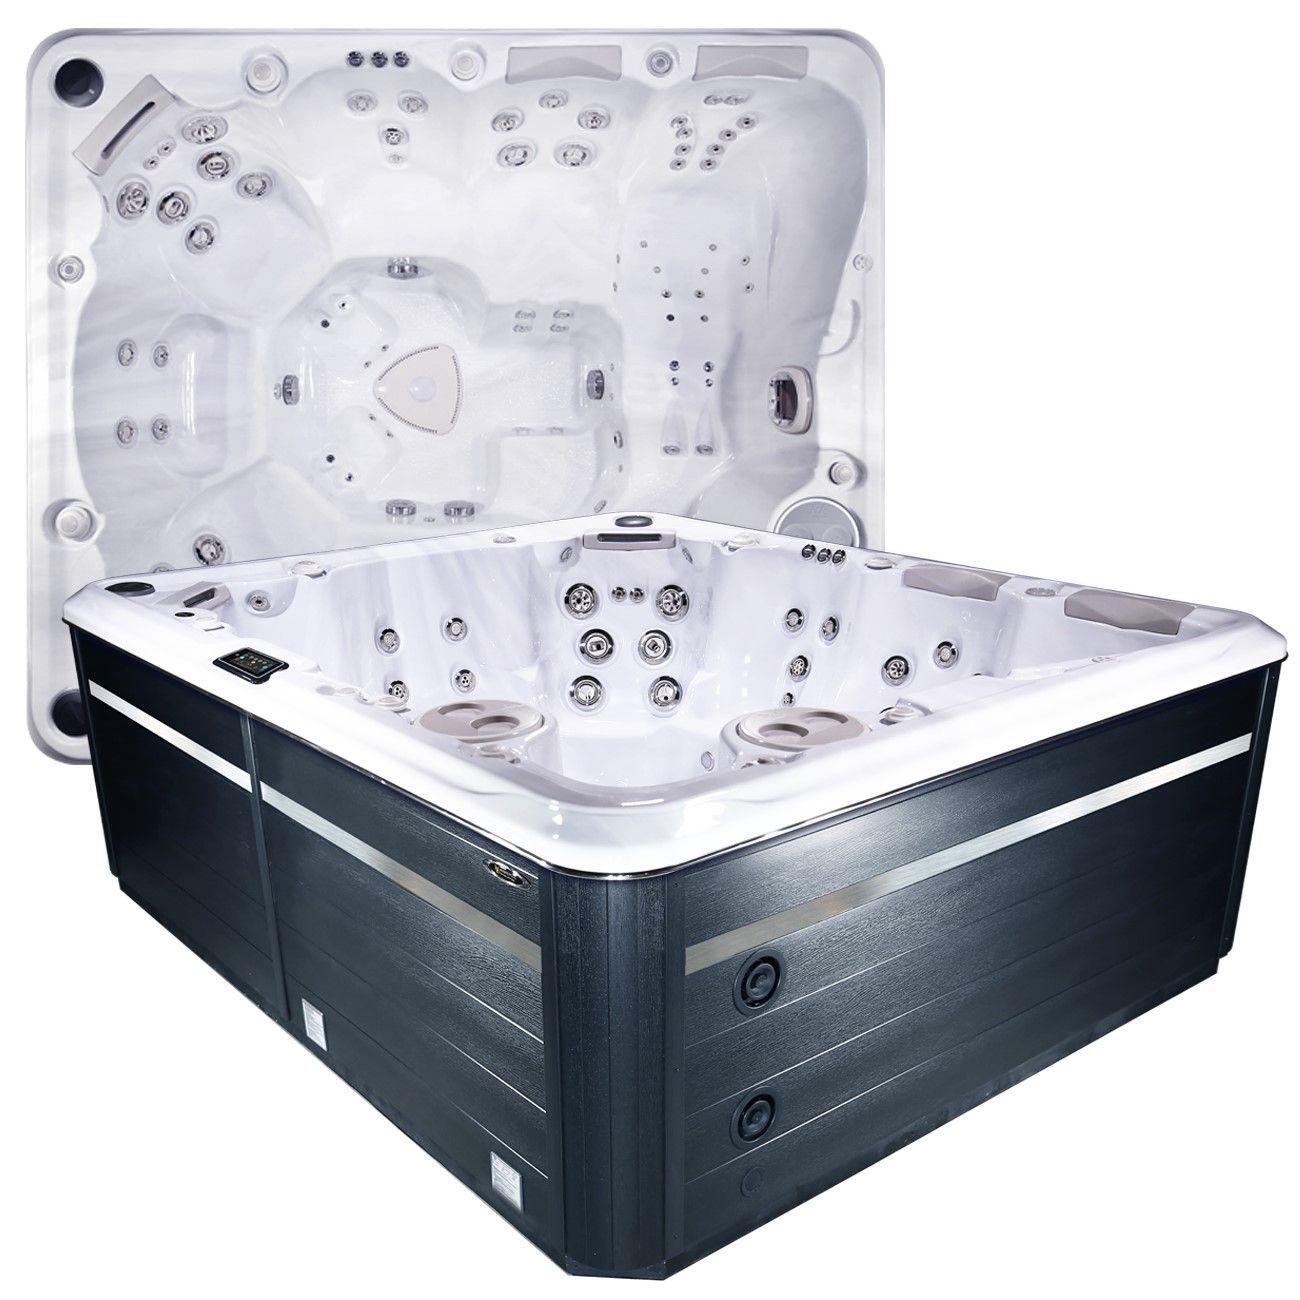 Гидромассажный бассейн с 70 форсунками Hydropool Self Cleaning 970 Titanium 239х279 ФОТО